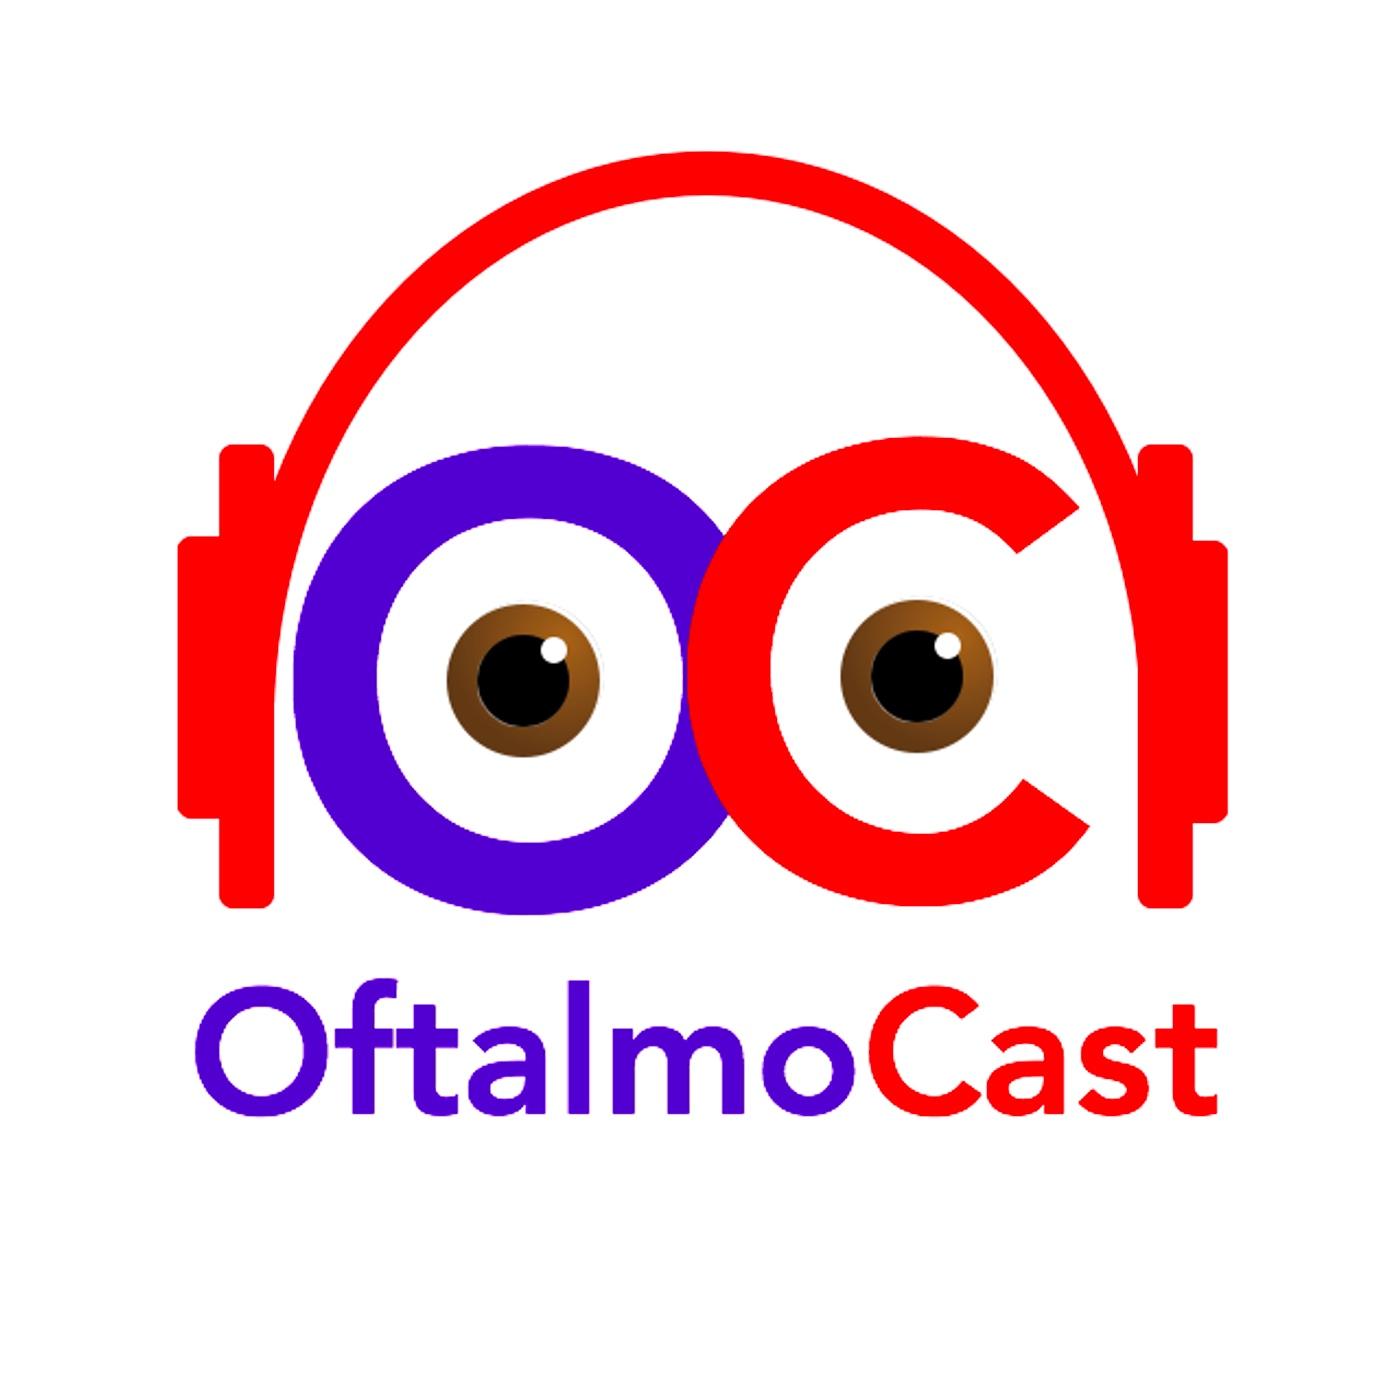 Oftalmo Cast